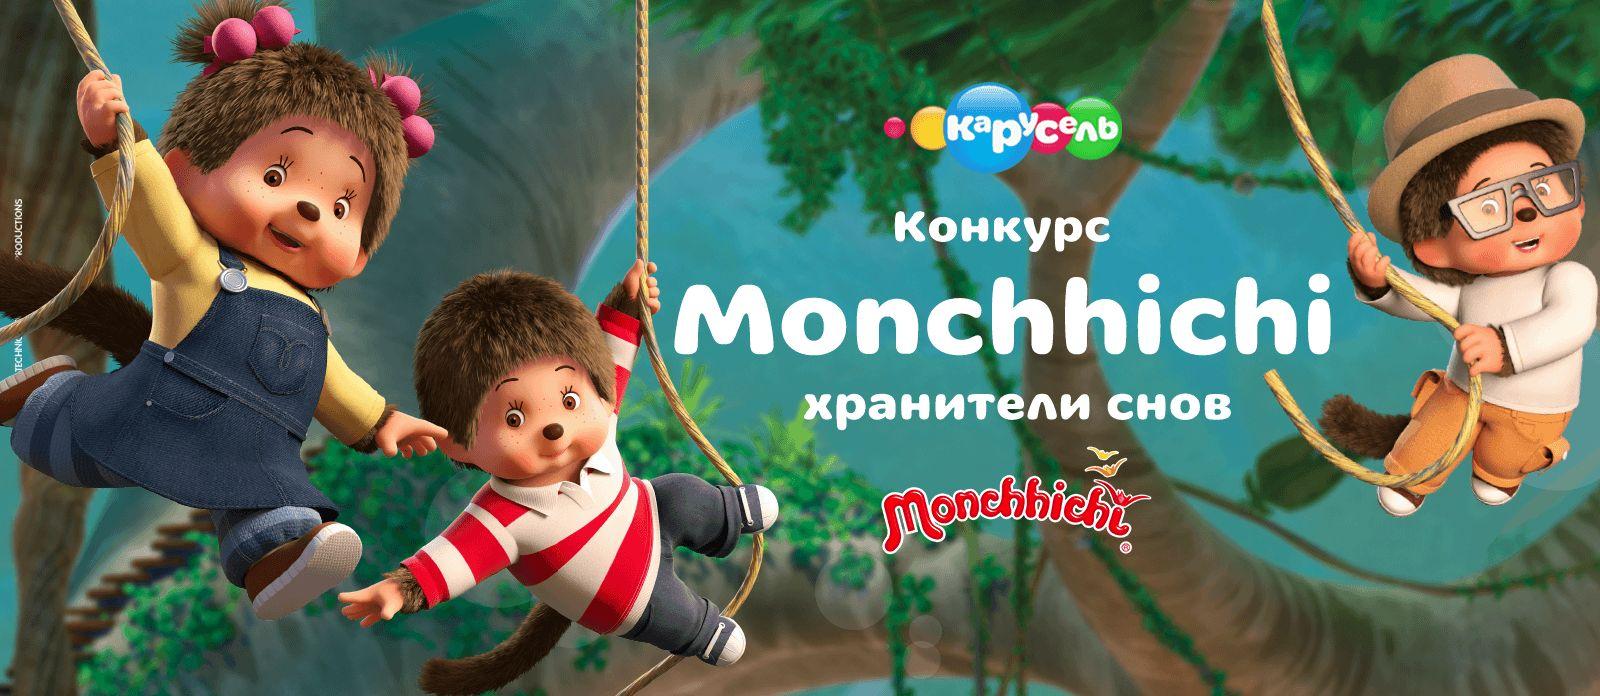 Конкурс: «Monchhichi – хранители снов»